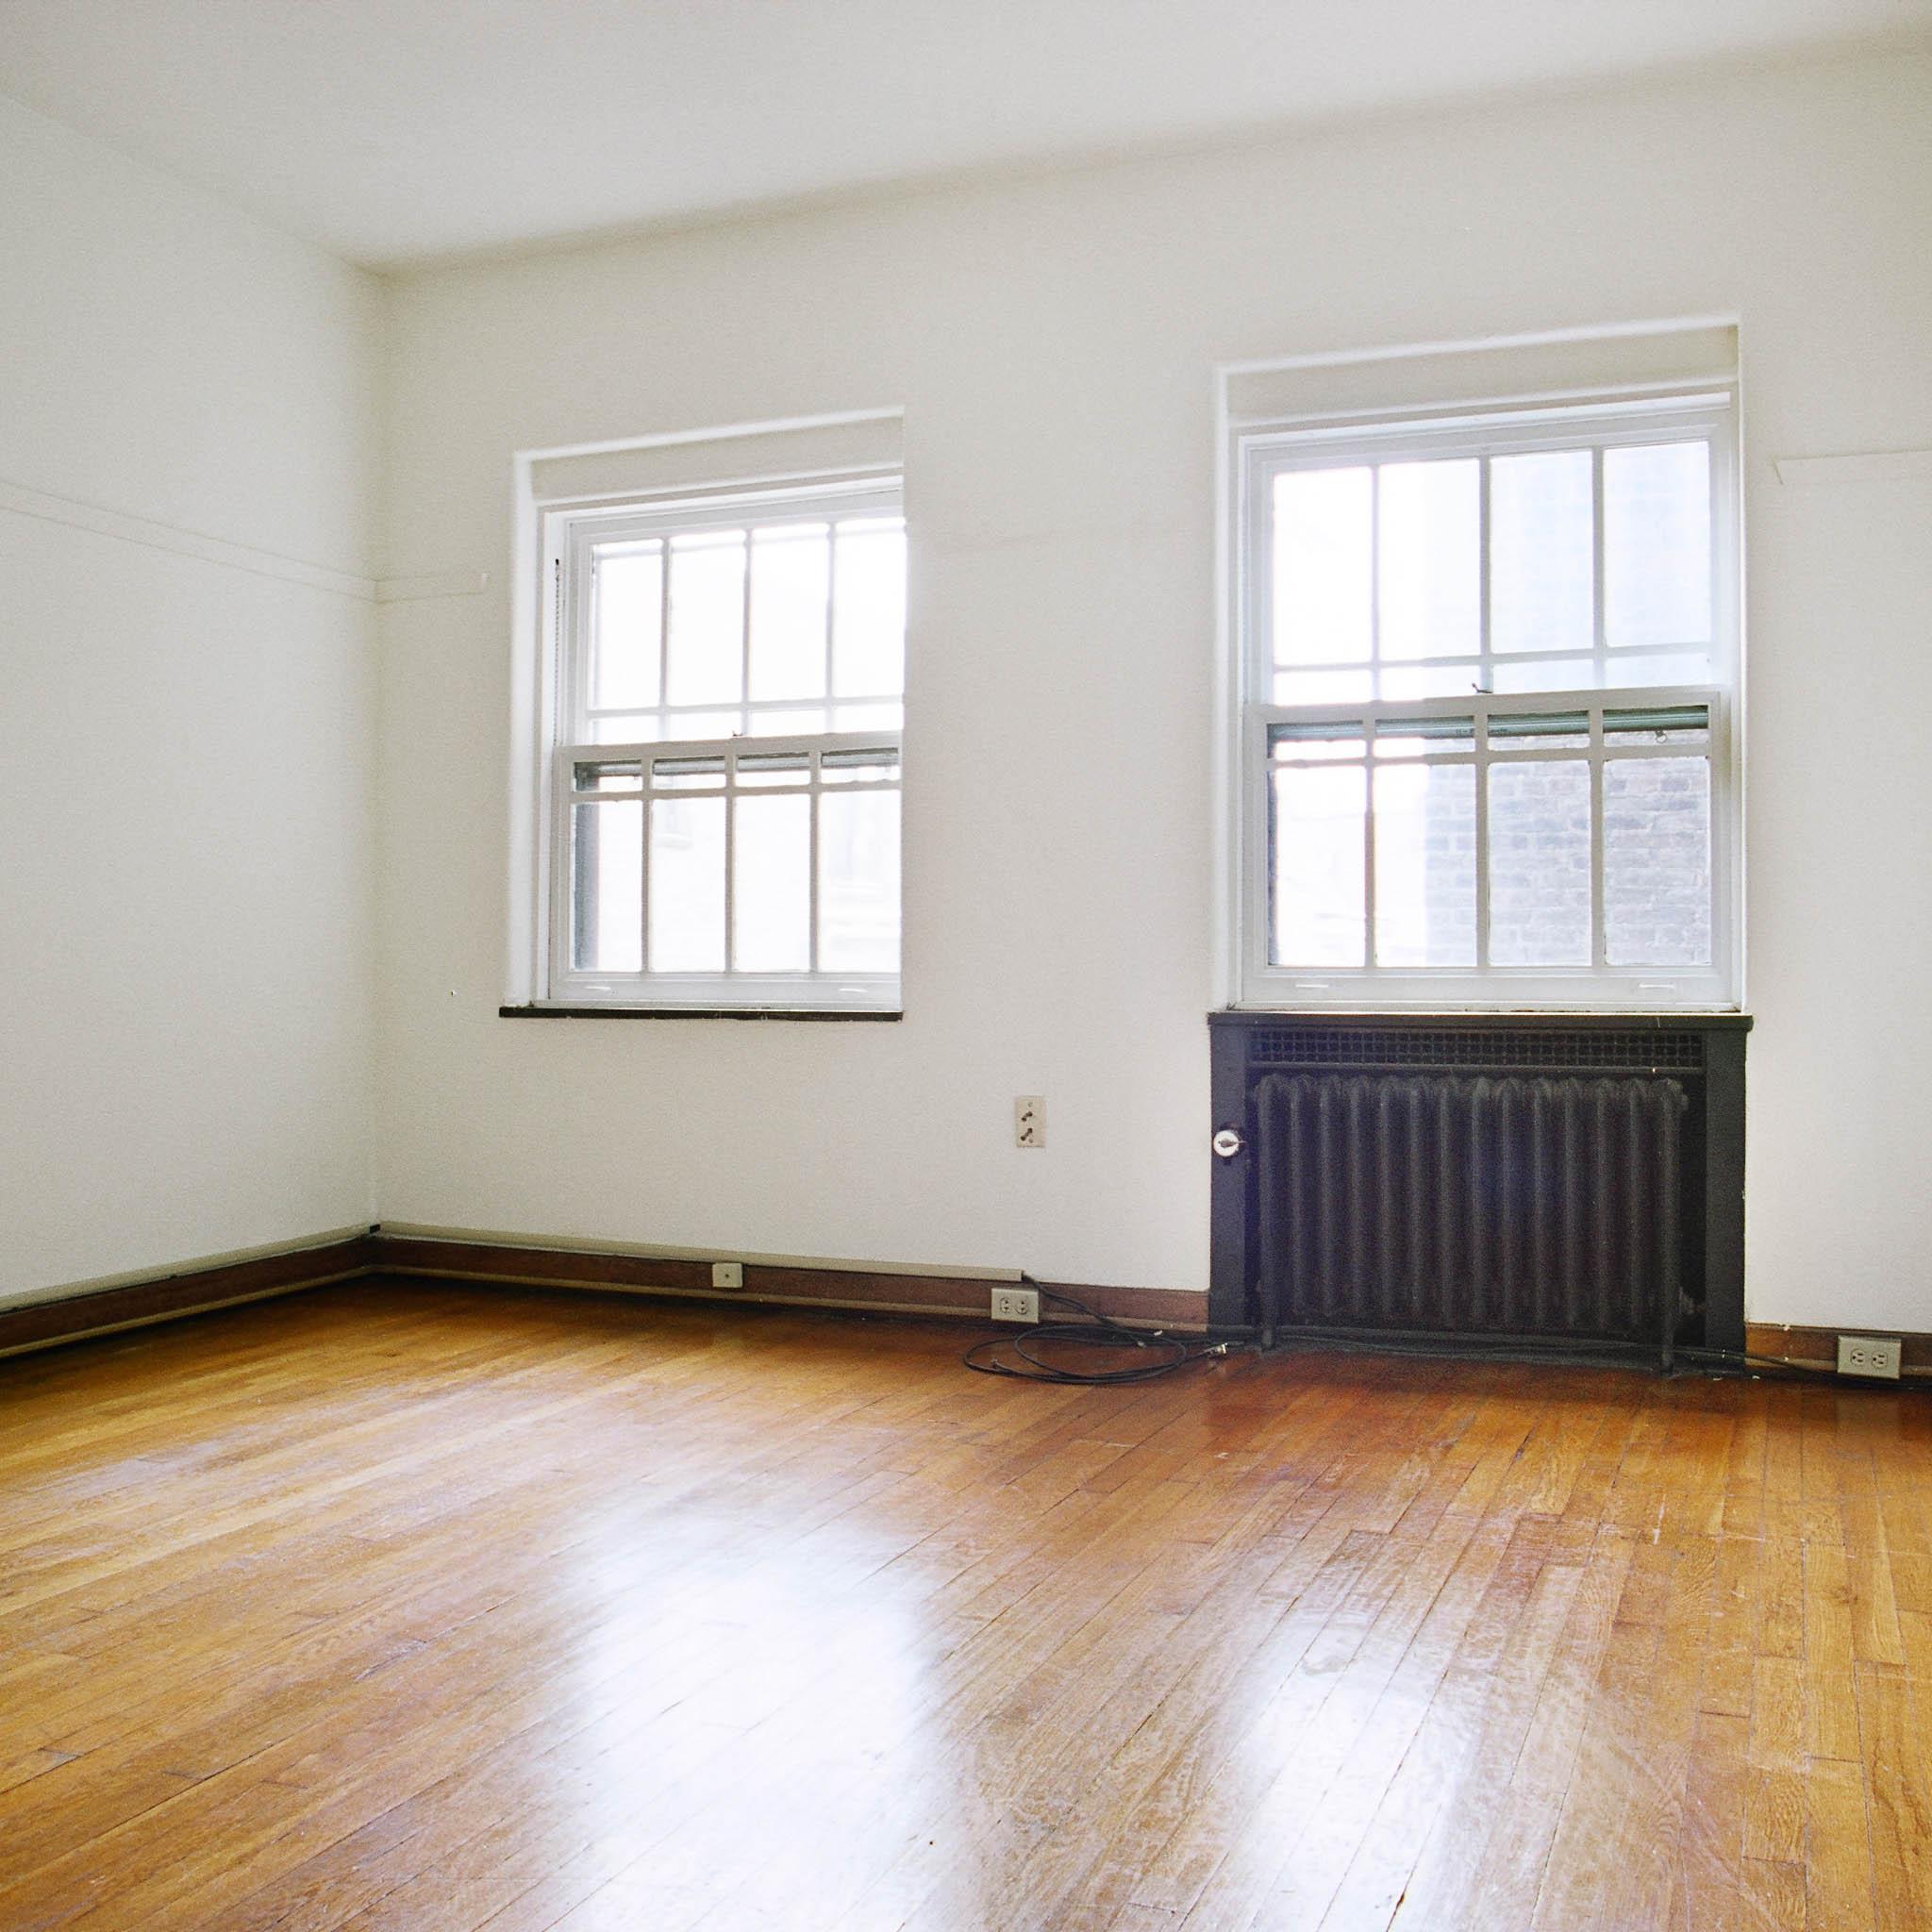 interior of 342 S. Highland Ave, Apt. 11B 4